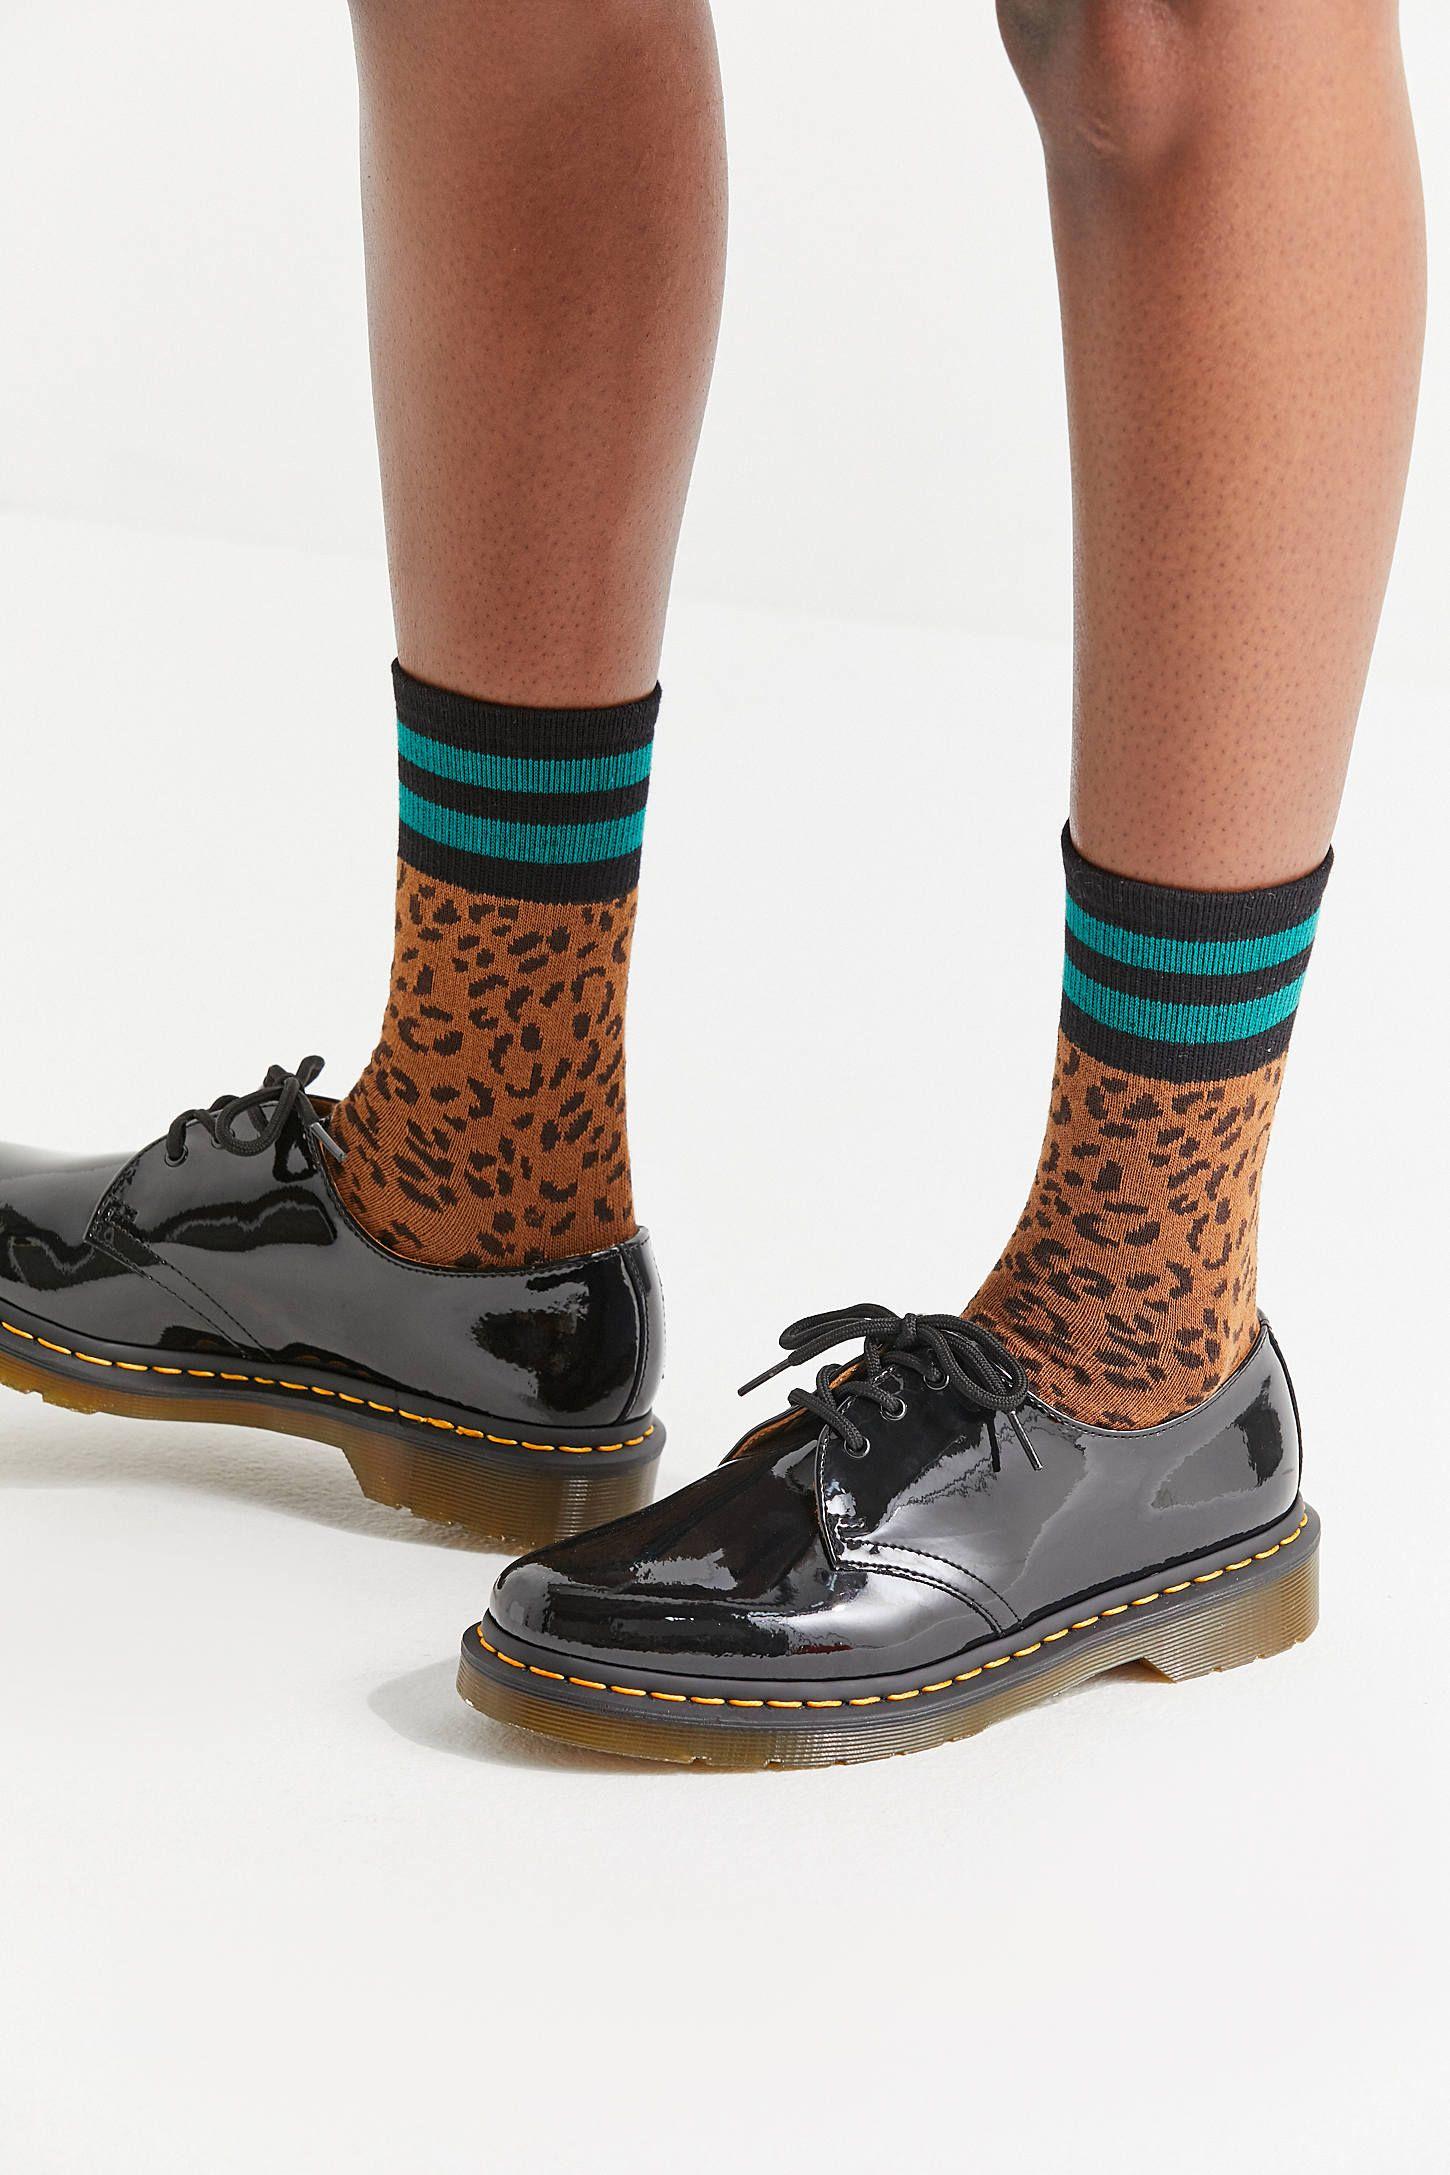 825b2a25a5 Dr. Martens 1461 Patent 3-Eye Oxford in 2019   kicks.   Oxford shoes ...